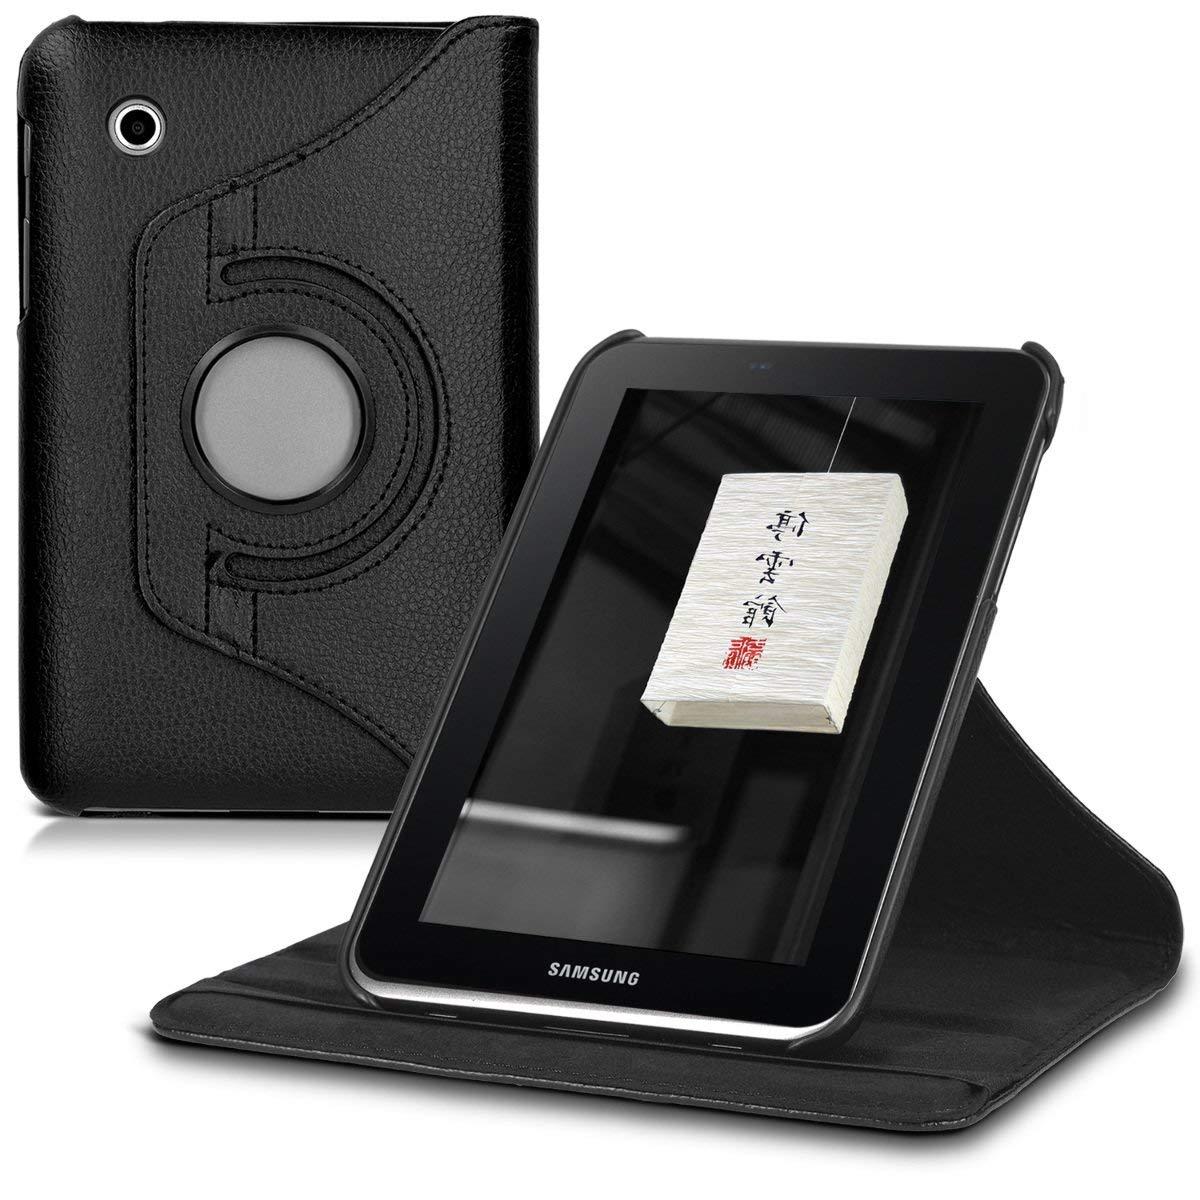 Tab 2 7 GT P3100 P3110 P3108 флип чехол-книжка из искусственной кожи чехол Подставка для Samsung Galaxy Tab 2 7